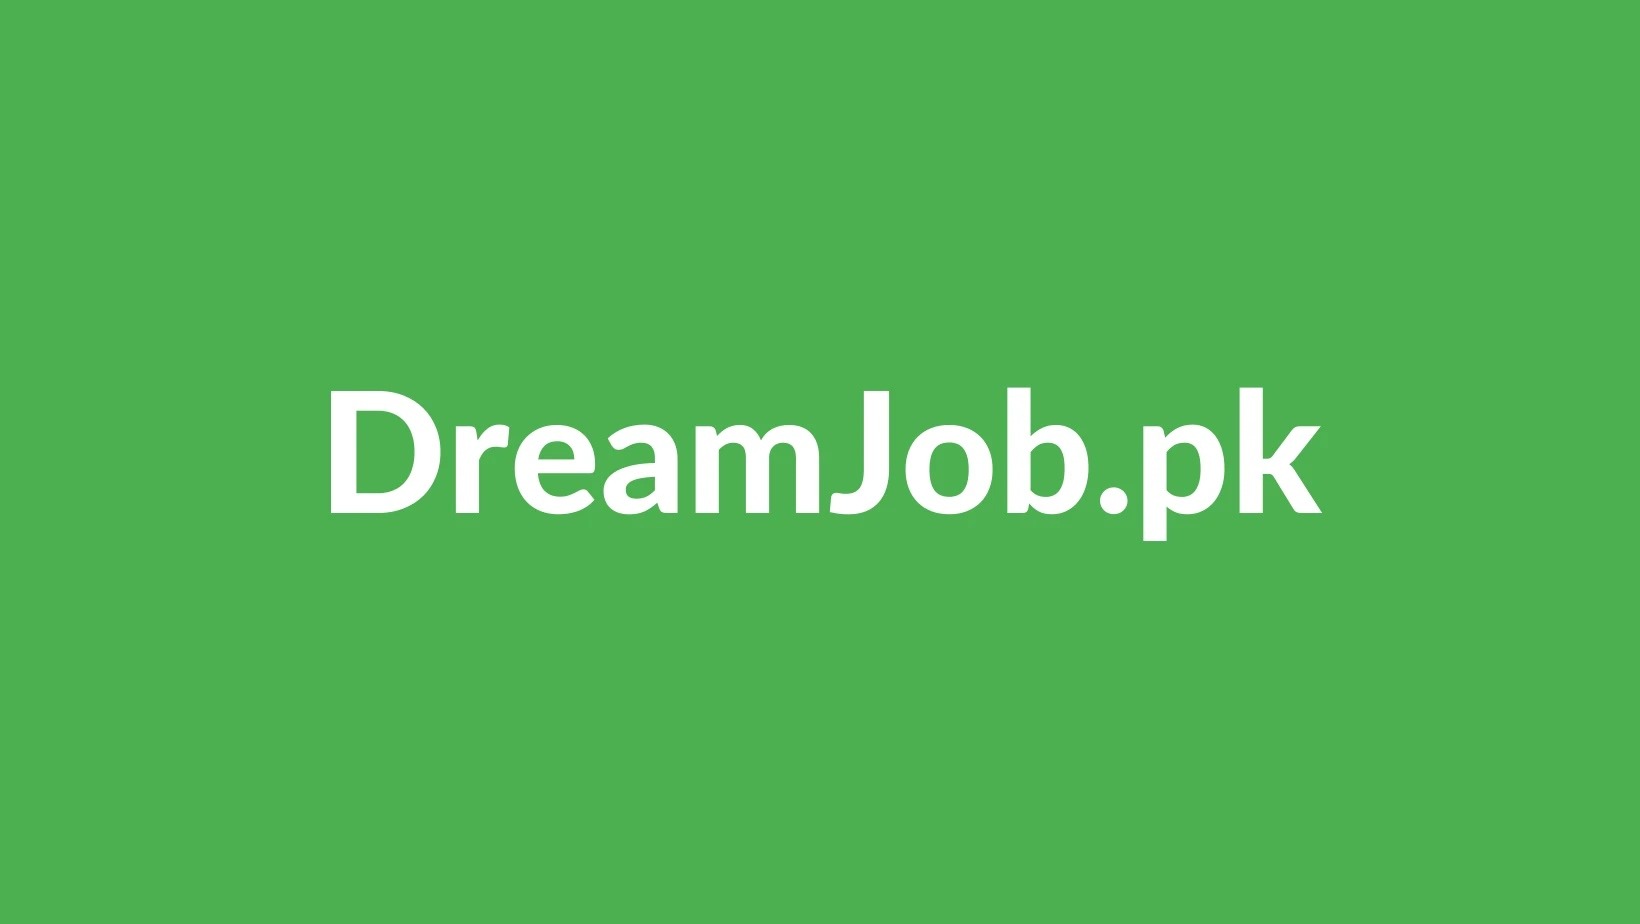 DreamJob.pk Logo